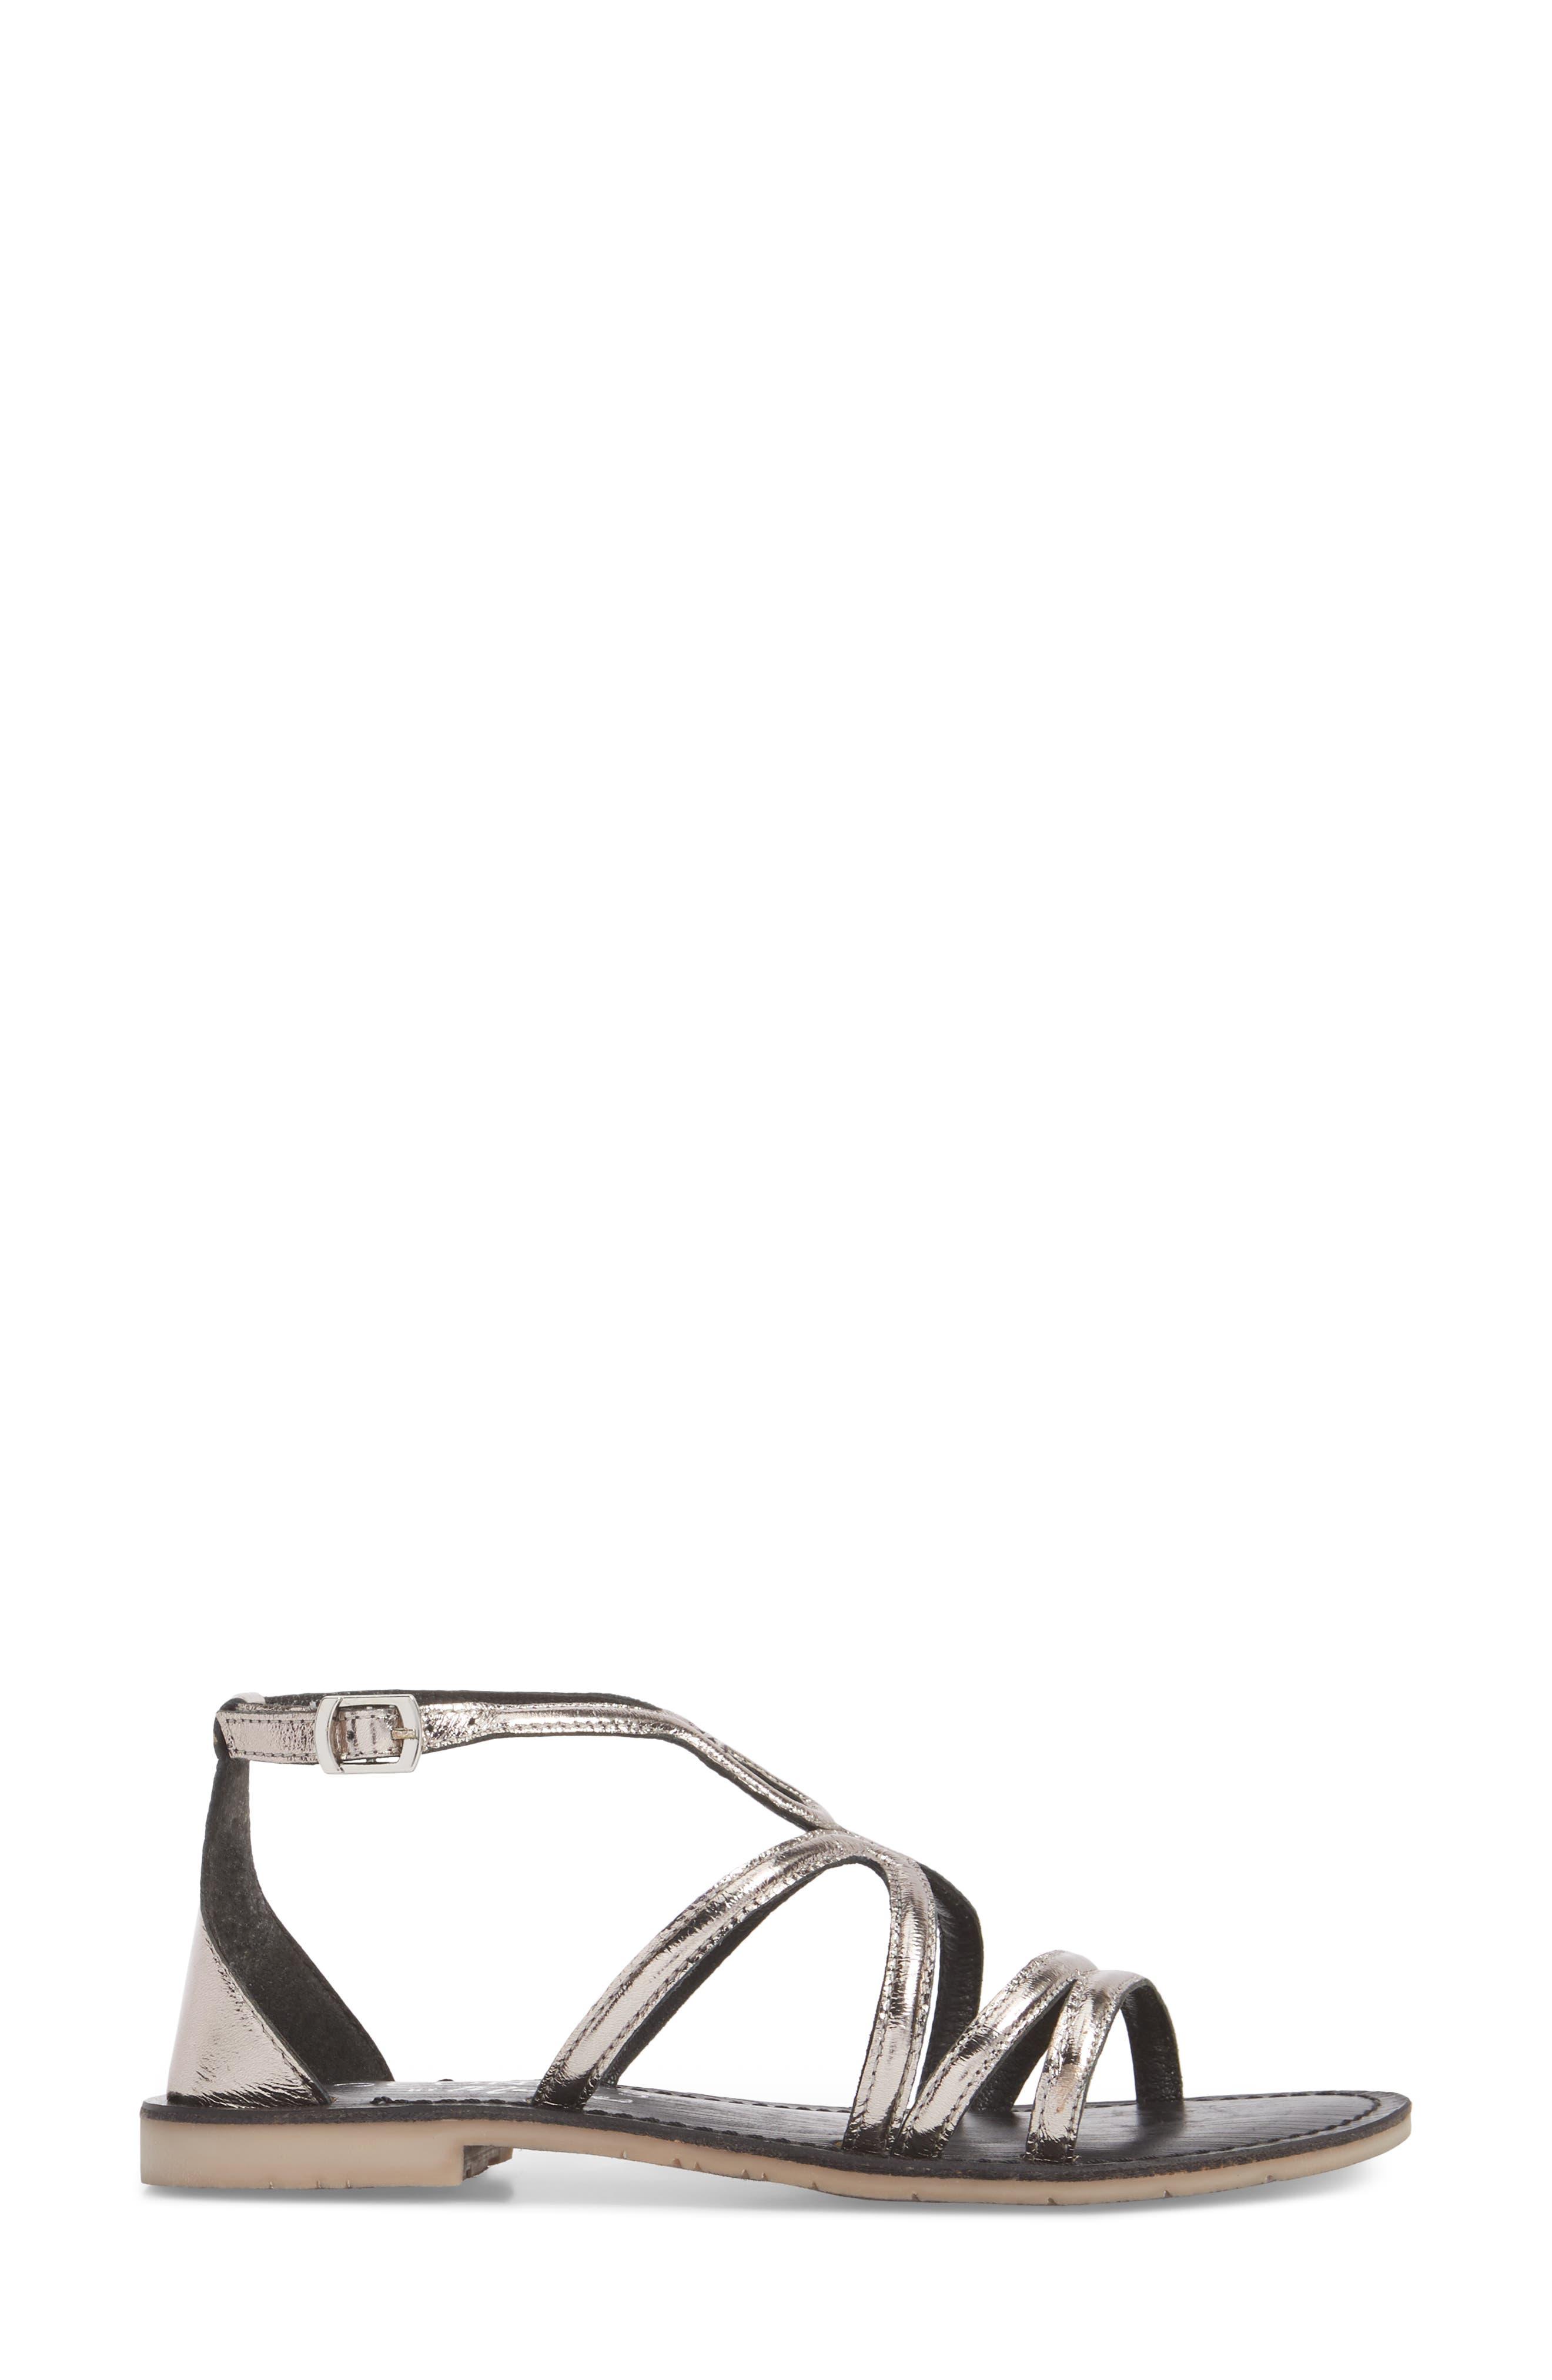 Palm Beach Metallic Sandal,                             Alternate thumbnail 3, color,                             PEWTER LEATHER